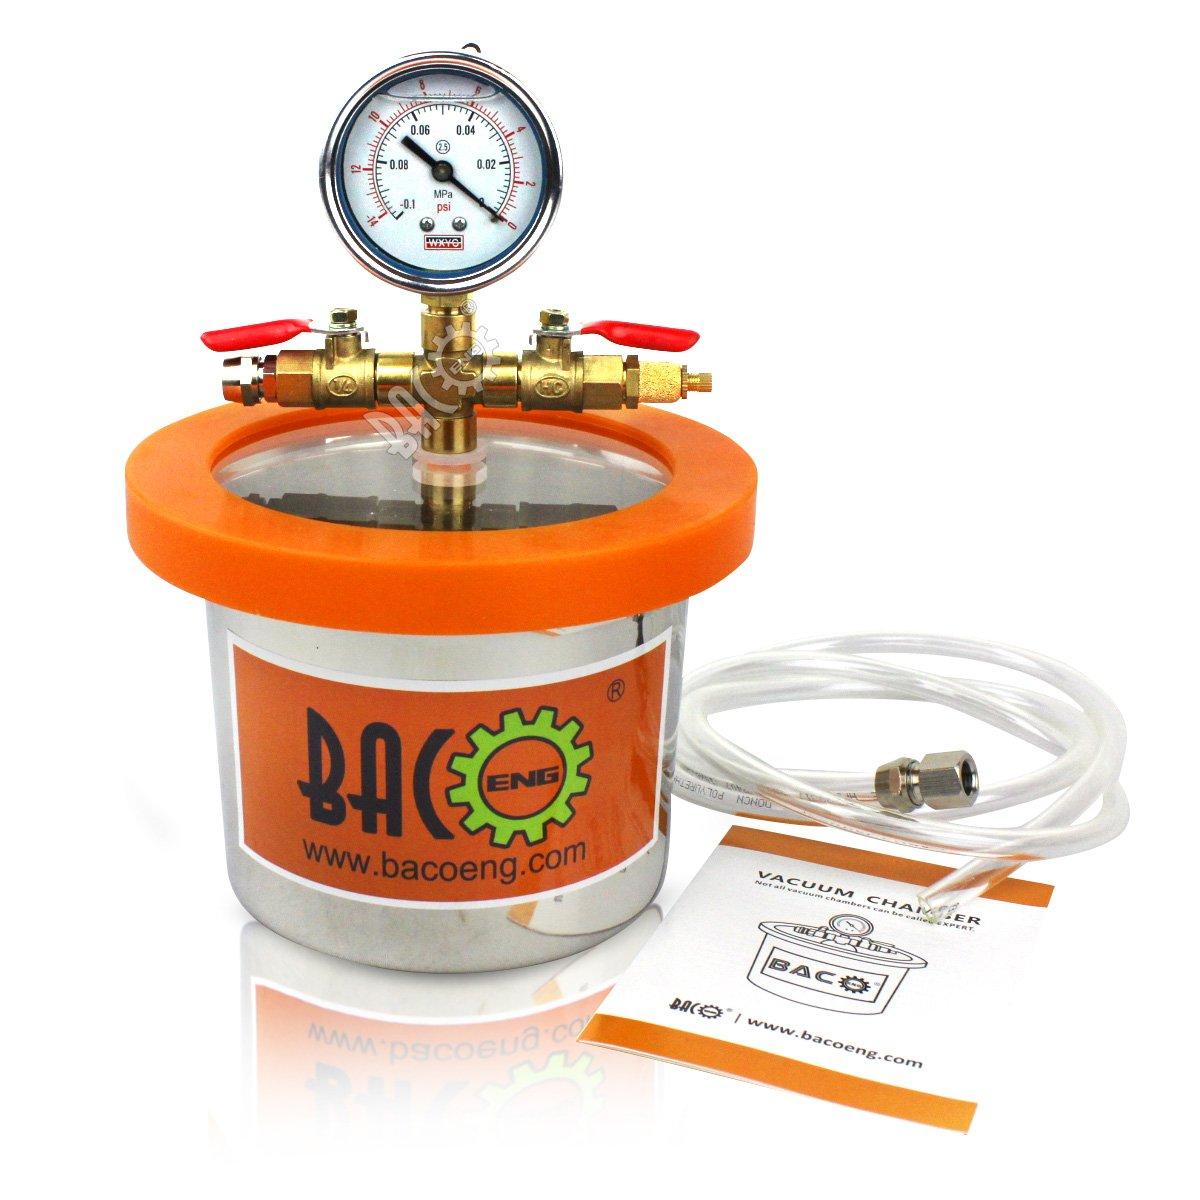 BACOENG Universal Vacuum Chamber Series: 2 Quart Standard by BACOENG